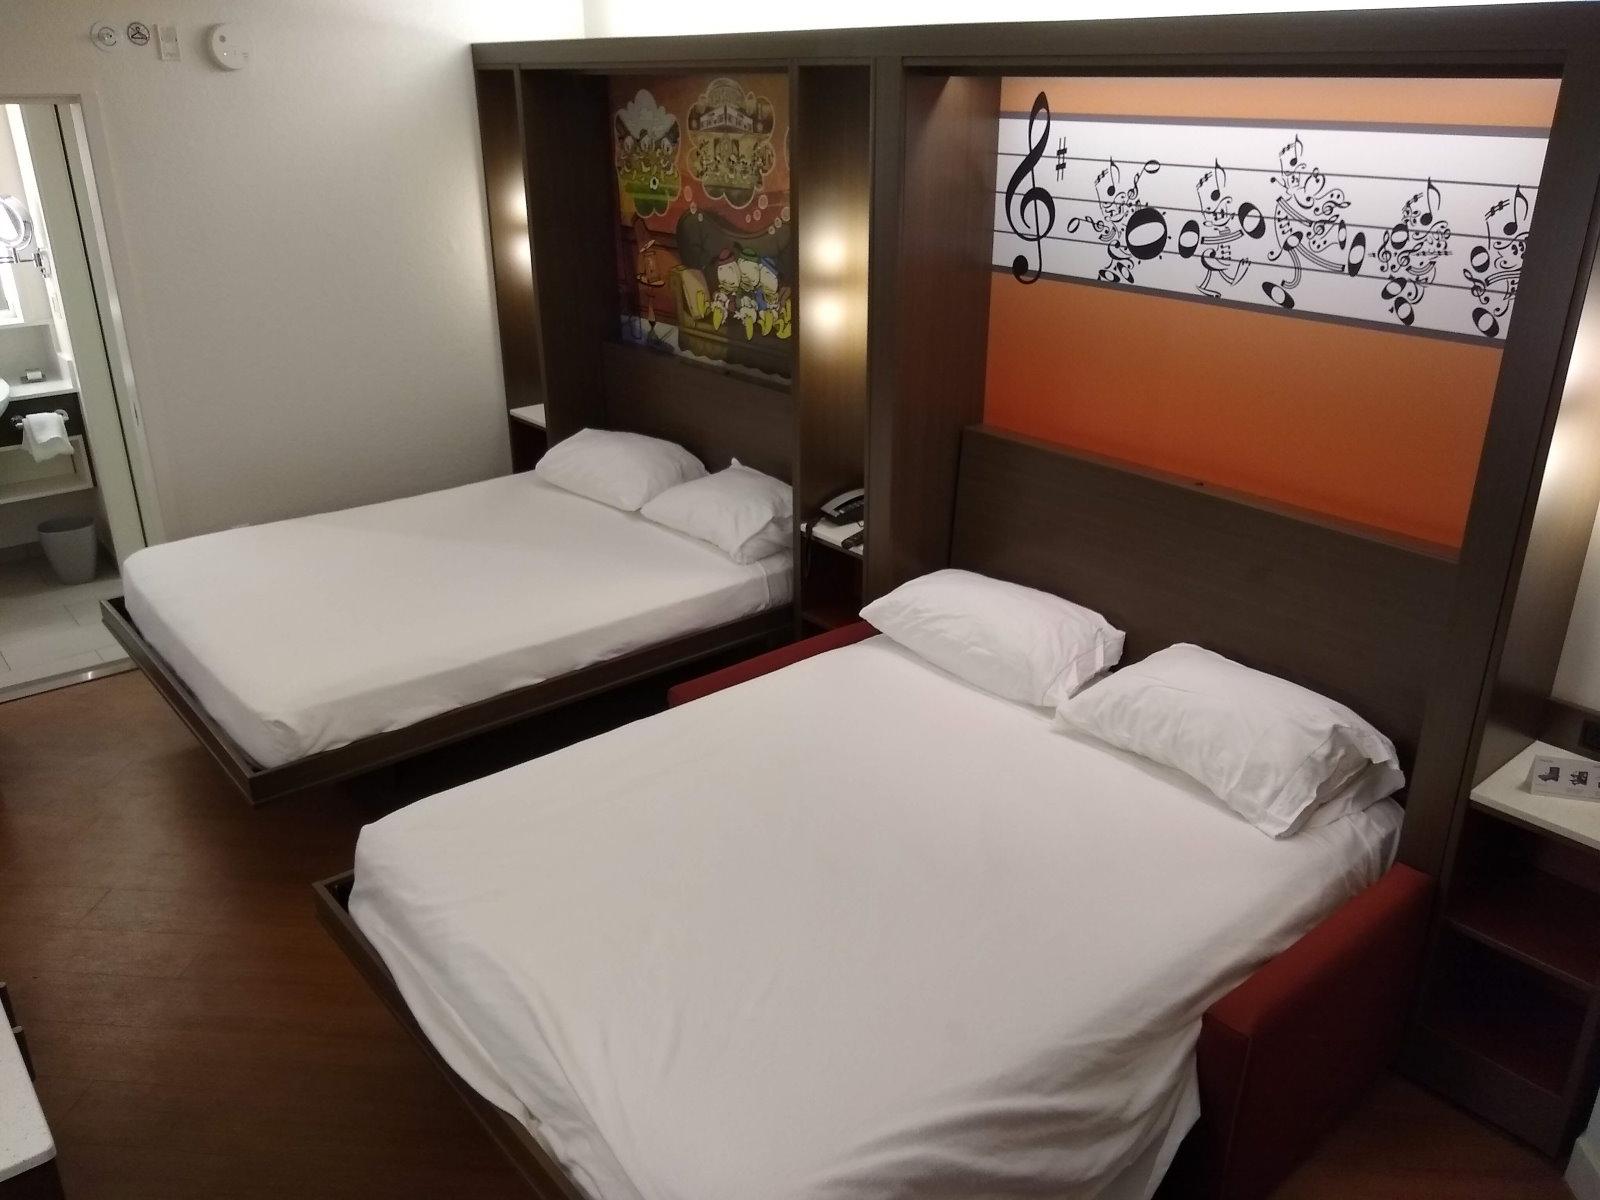 Photos Renovated All Star Music Family Suites Quick Photo Tour Touringplans Com Blog